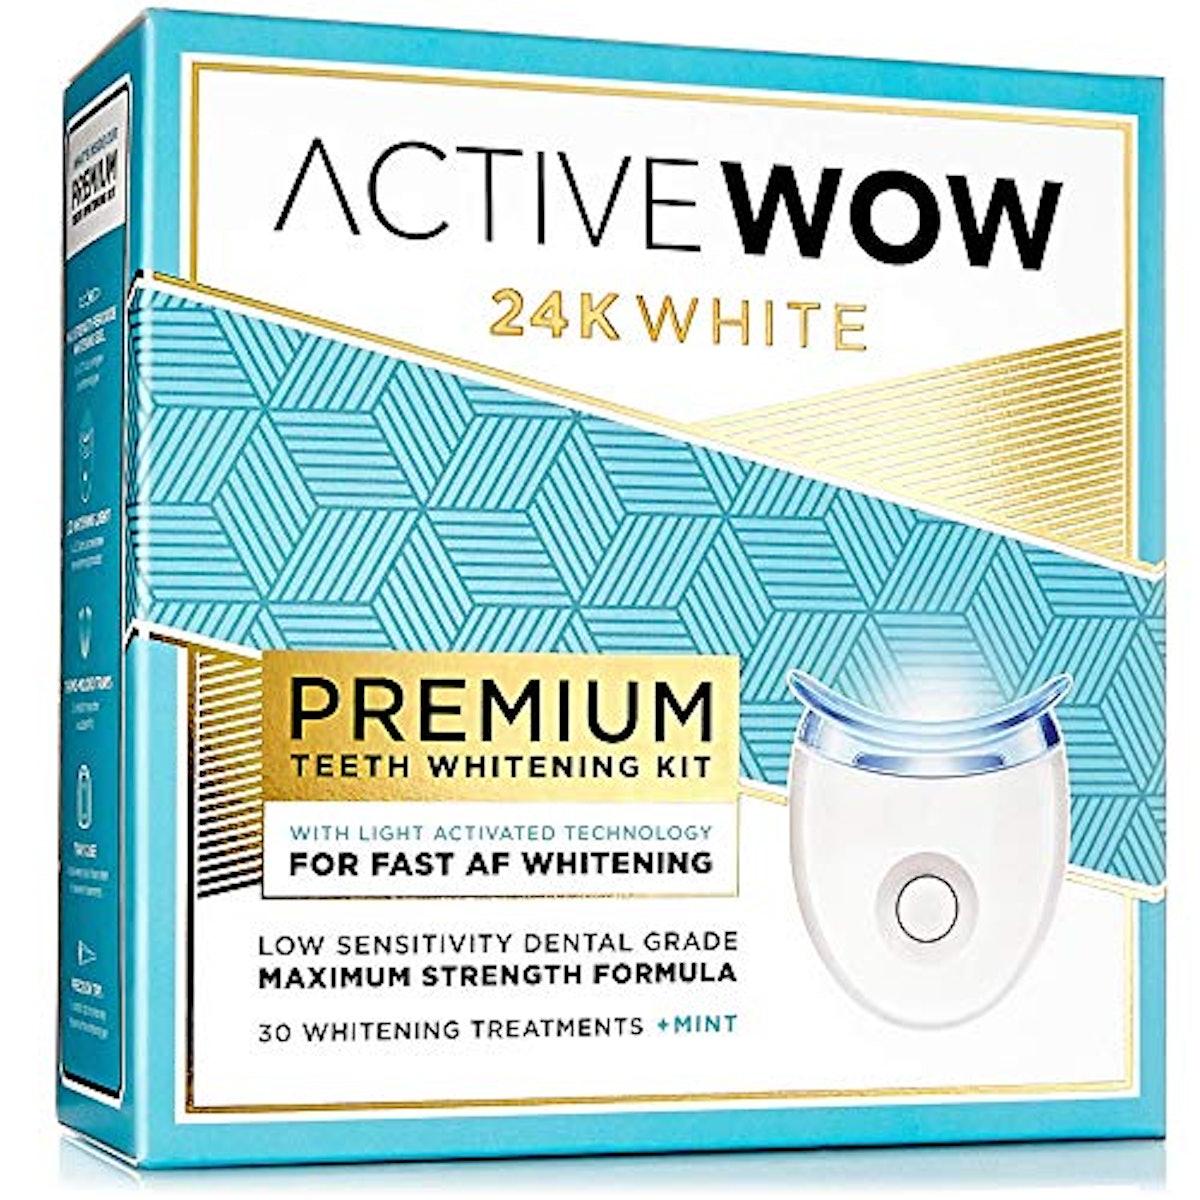 Active Wow Teeth Whitening Kit